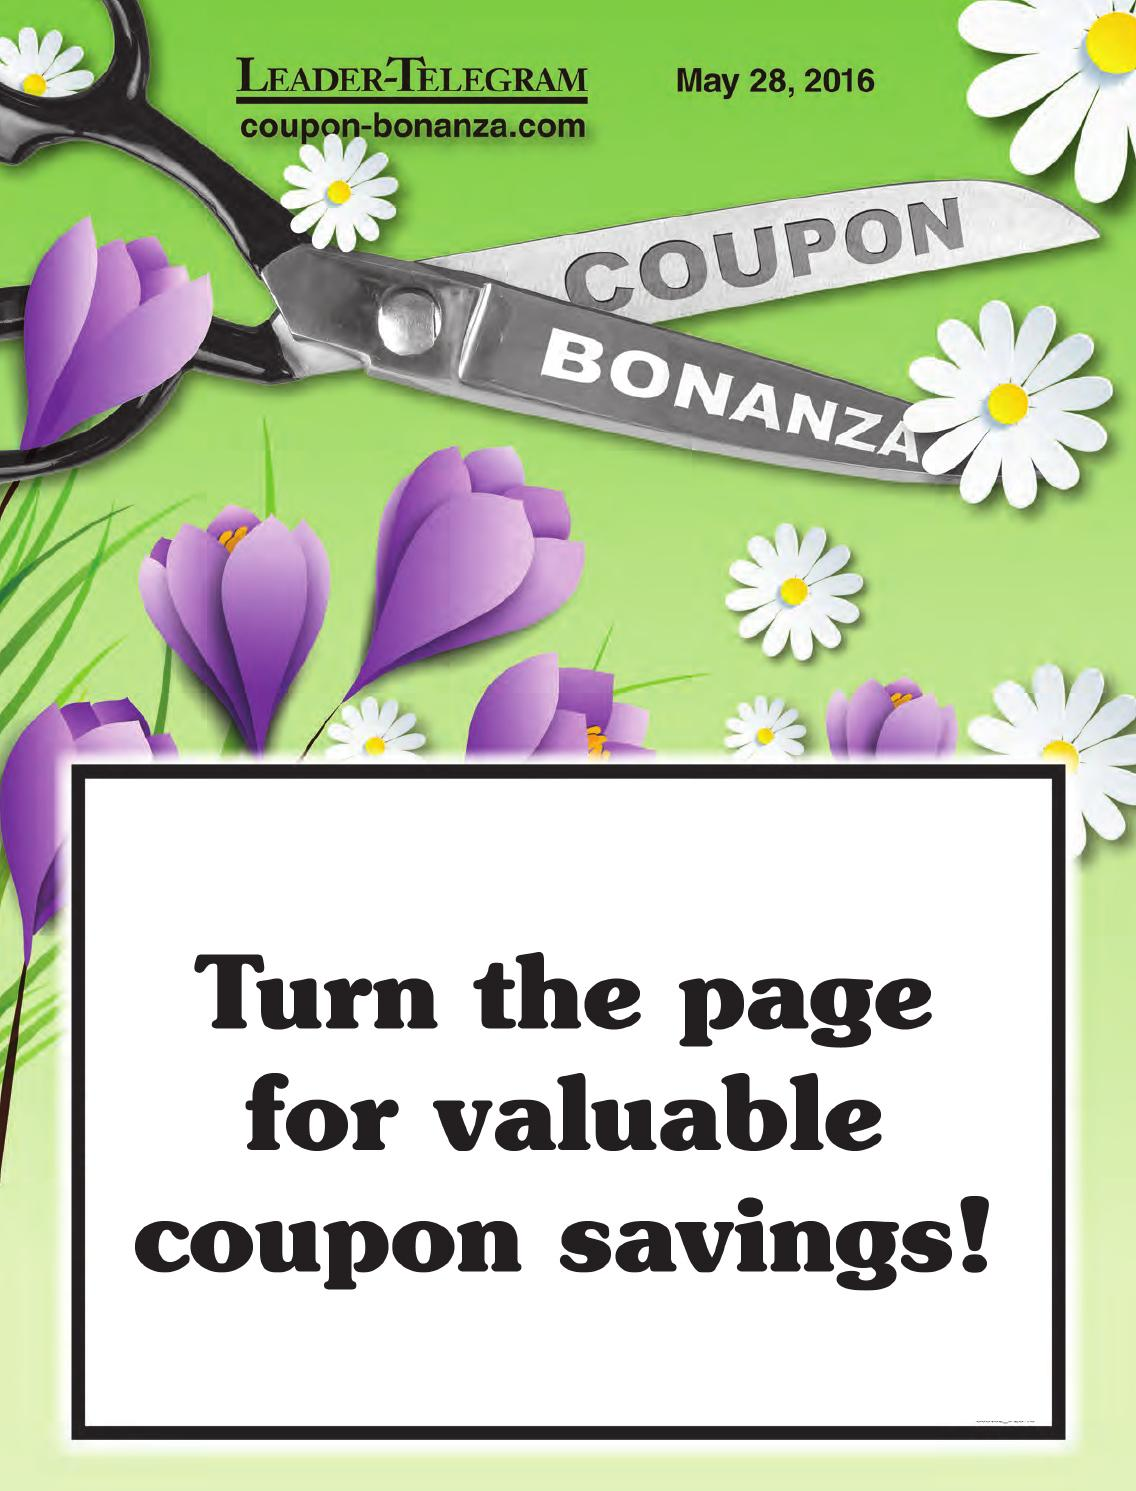 coupon bonanza may 28 2016 by leader telegram issuu